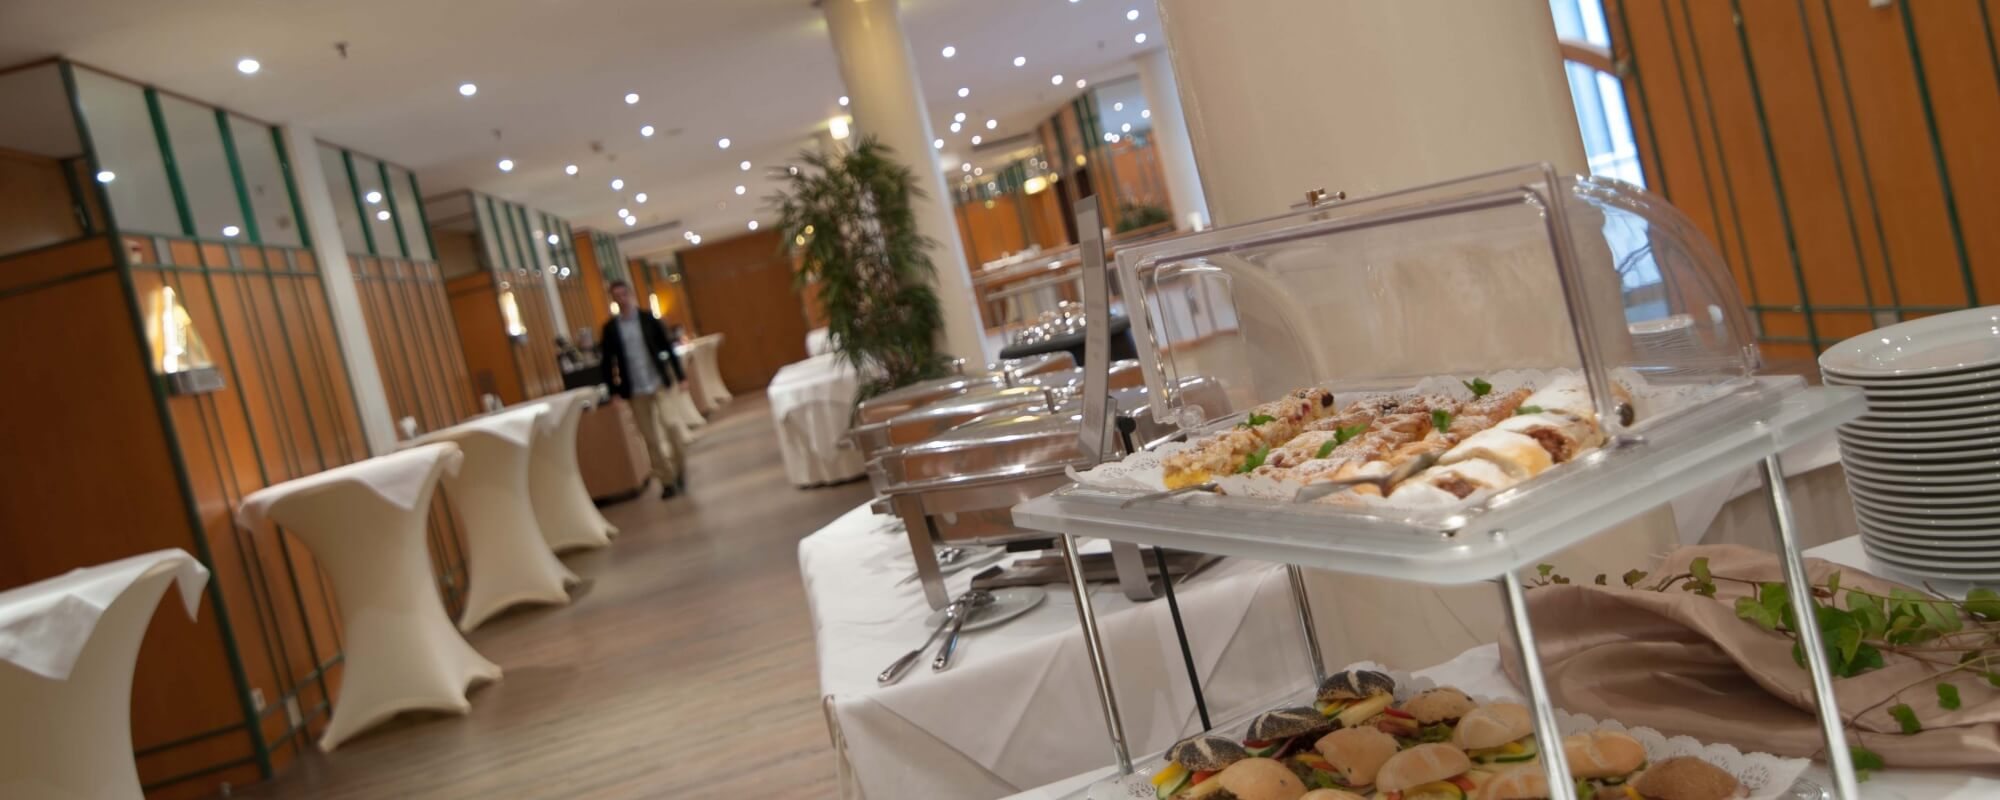 Seminar Cuisine